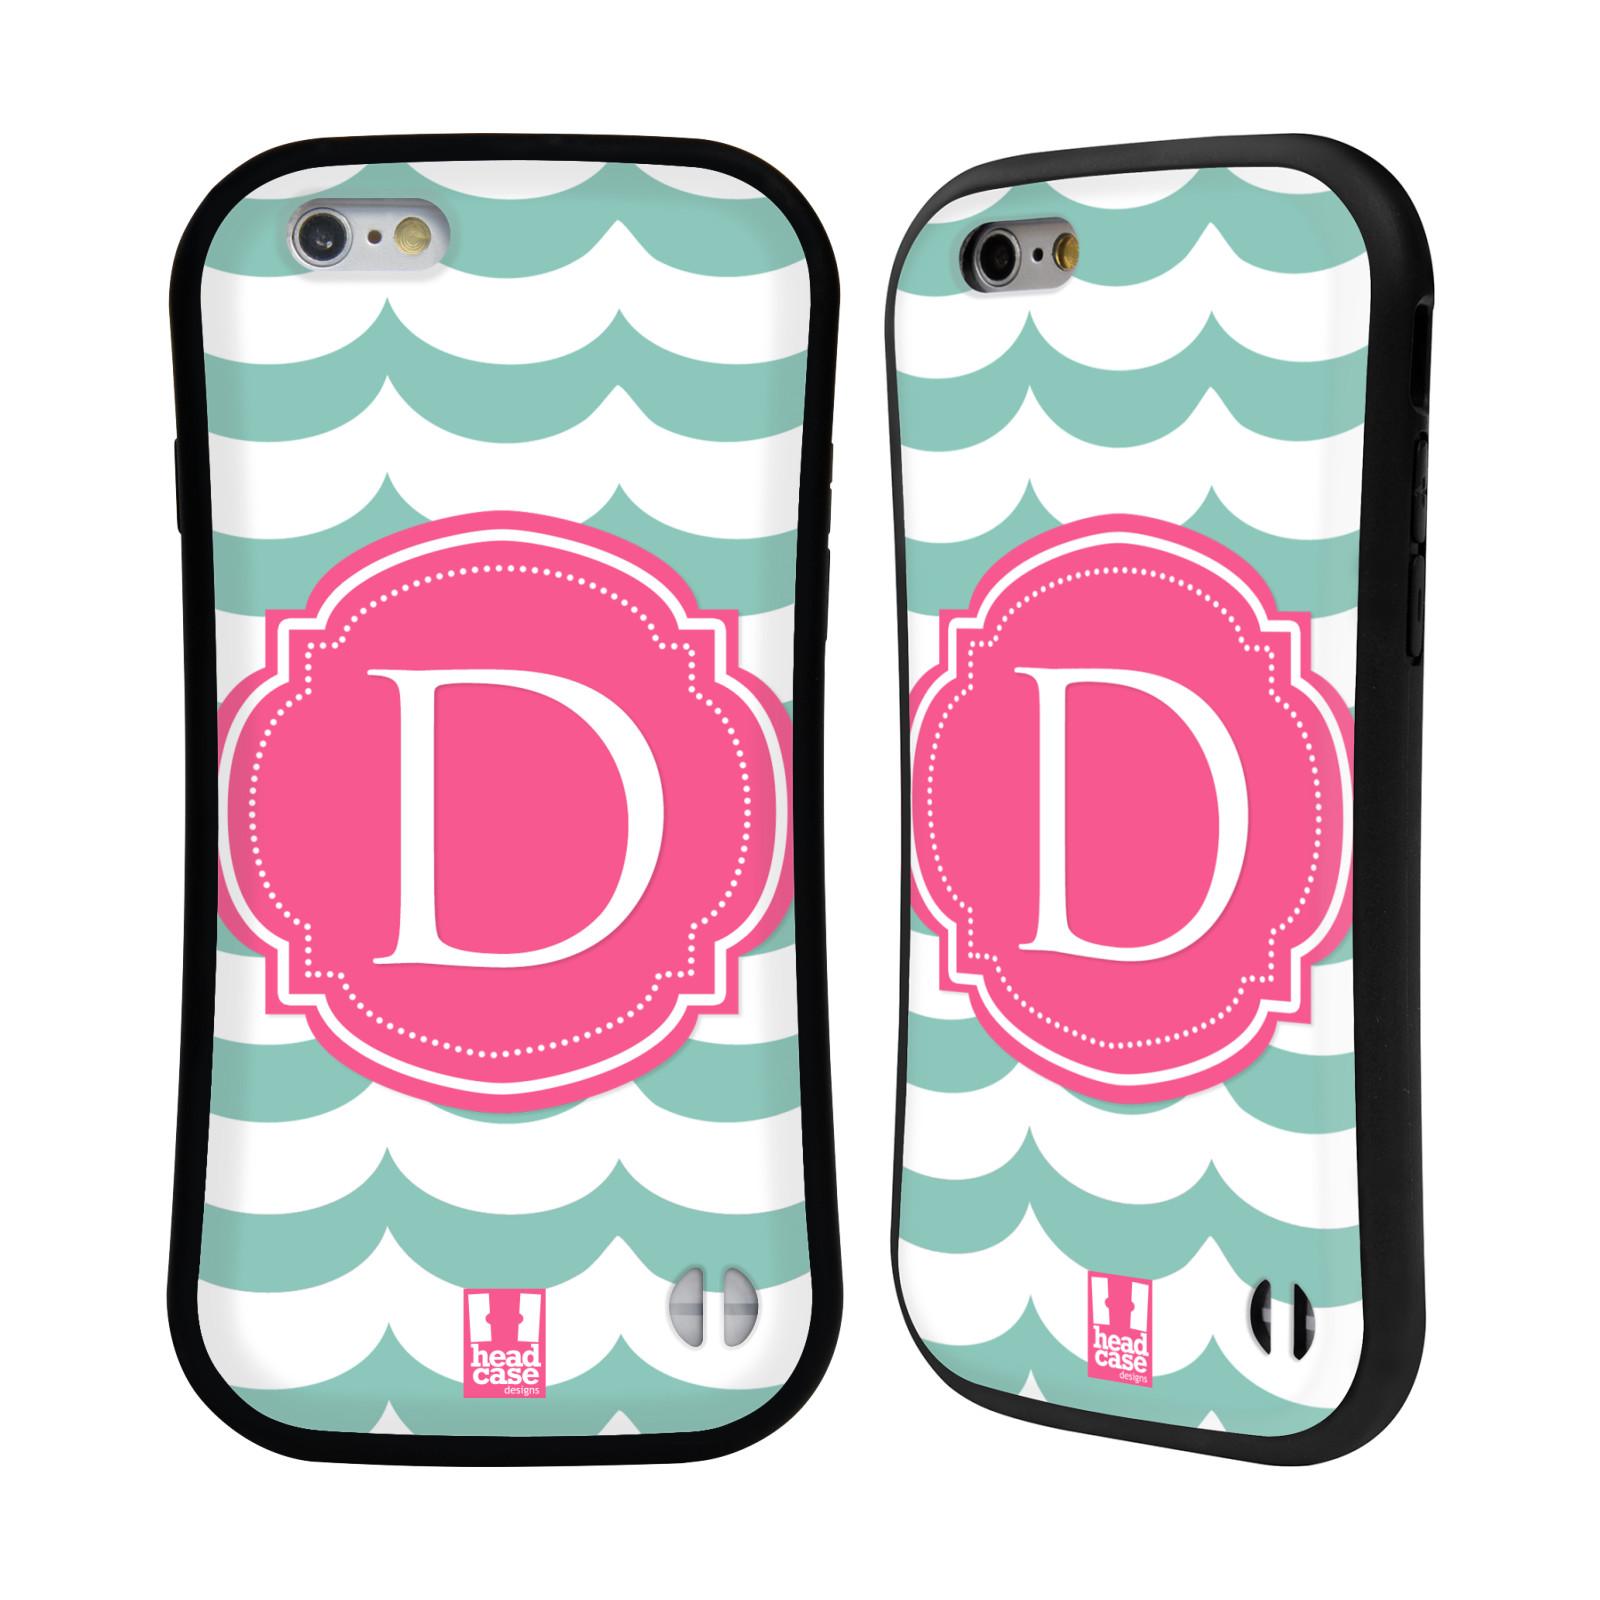 head case designs letter cases hybrid case for apple With letter phone case